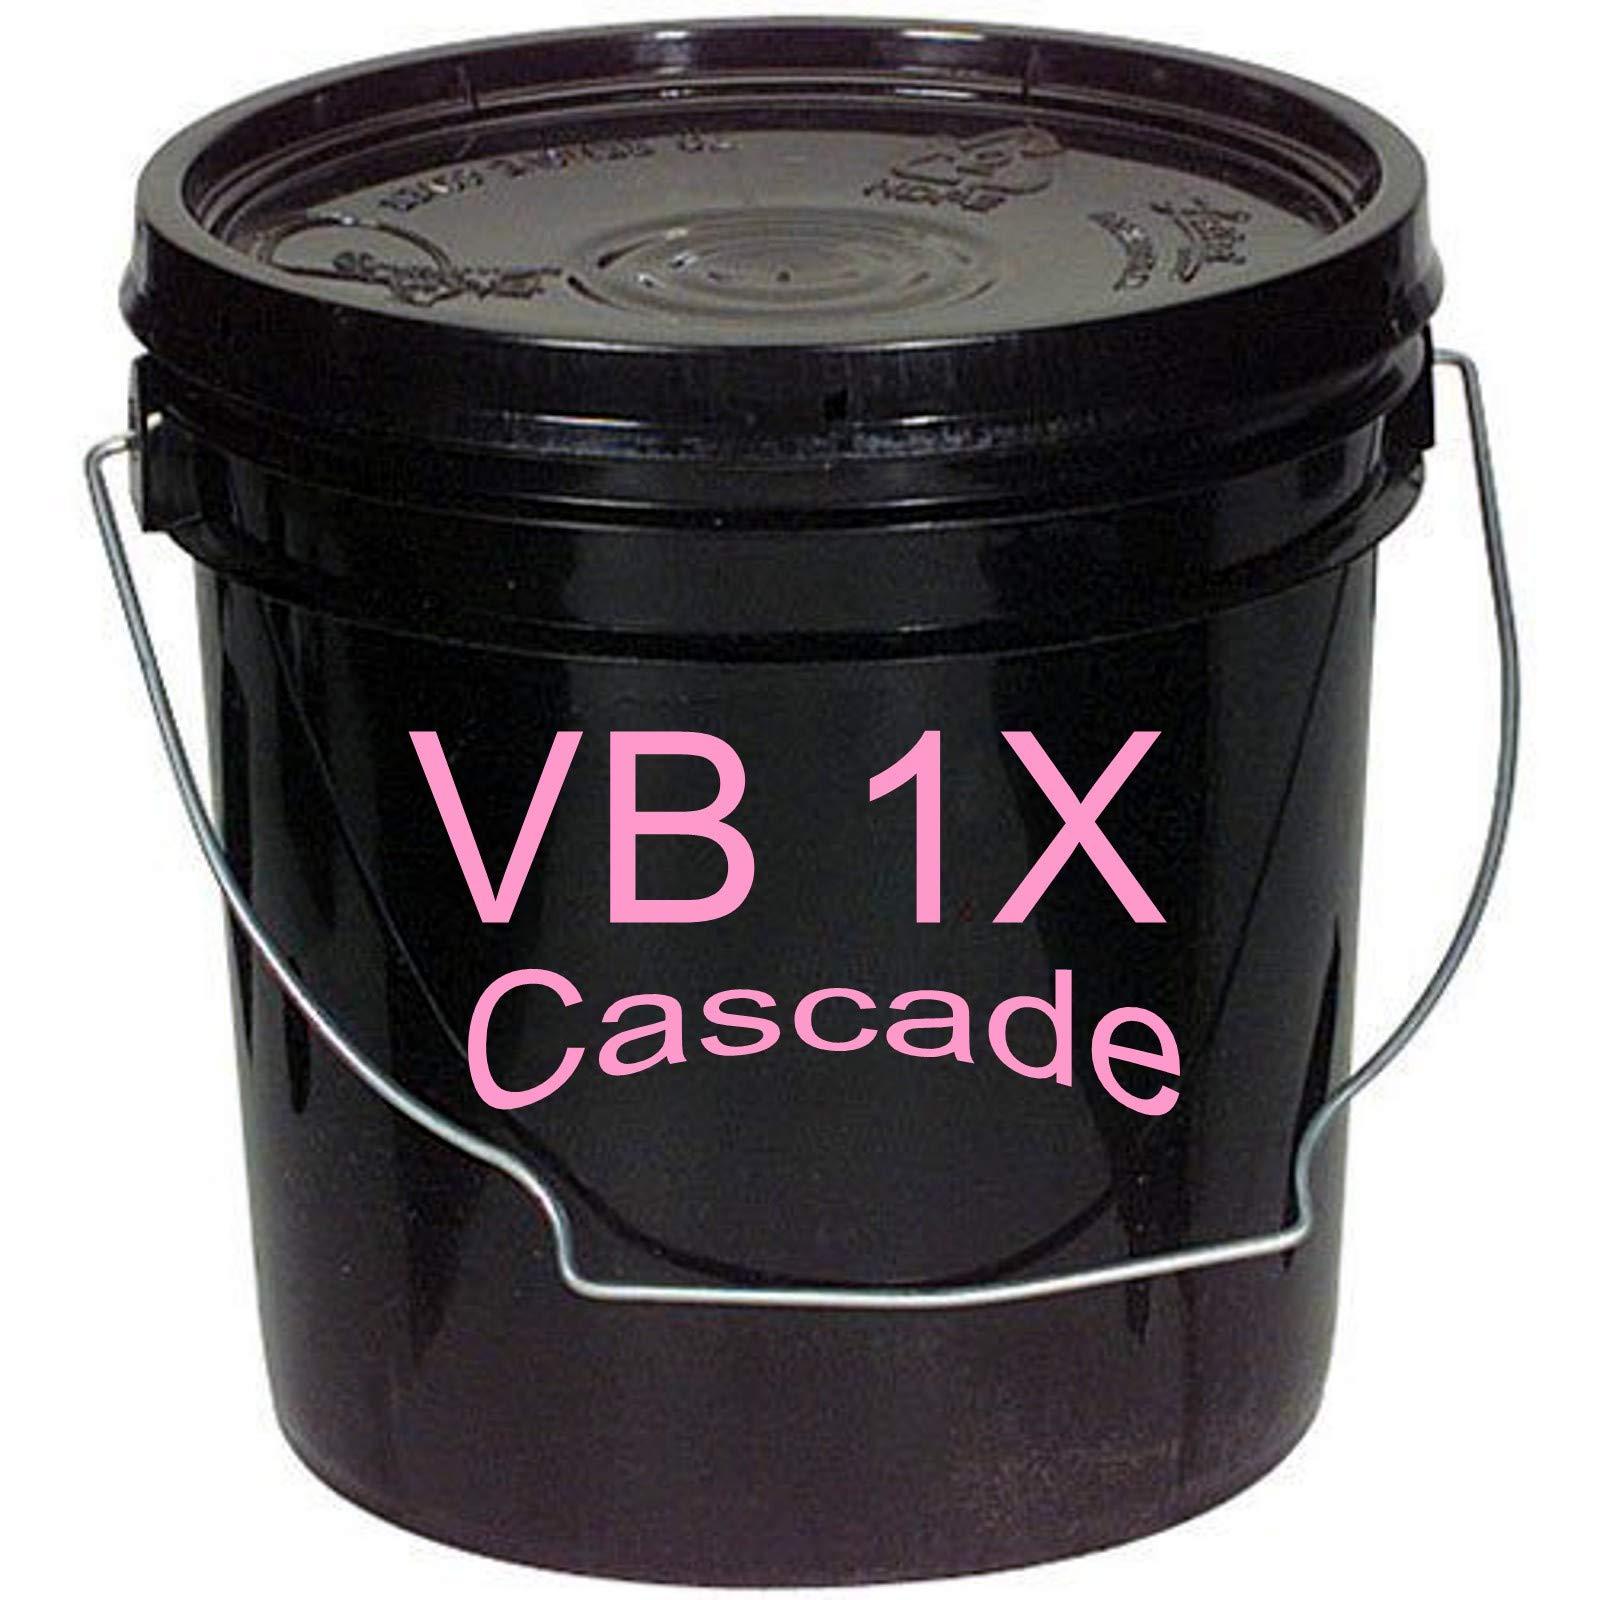 Cascade VB-1X(1G) Sprayable Acoustic Damping Compound 1 Gal